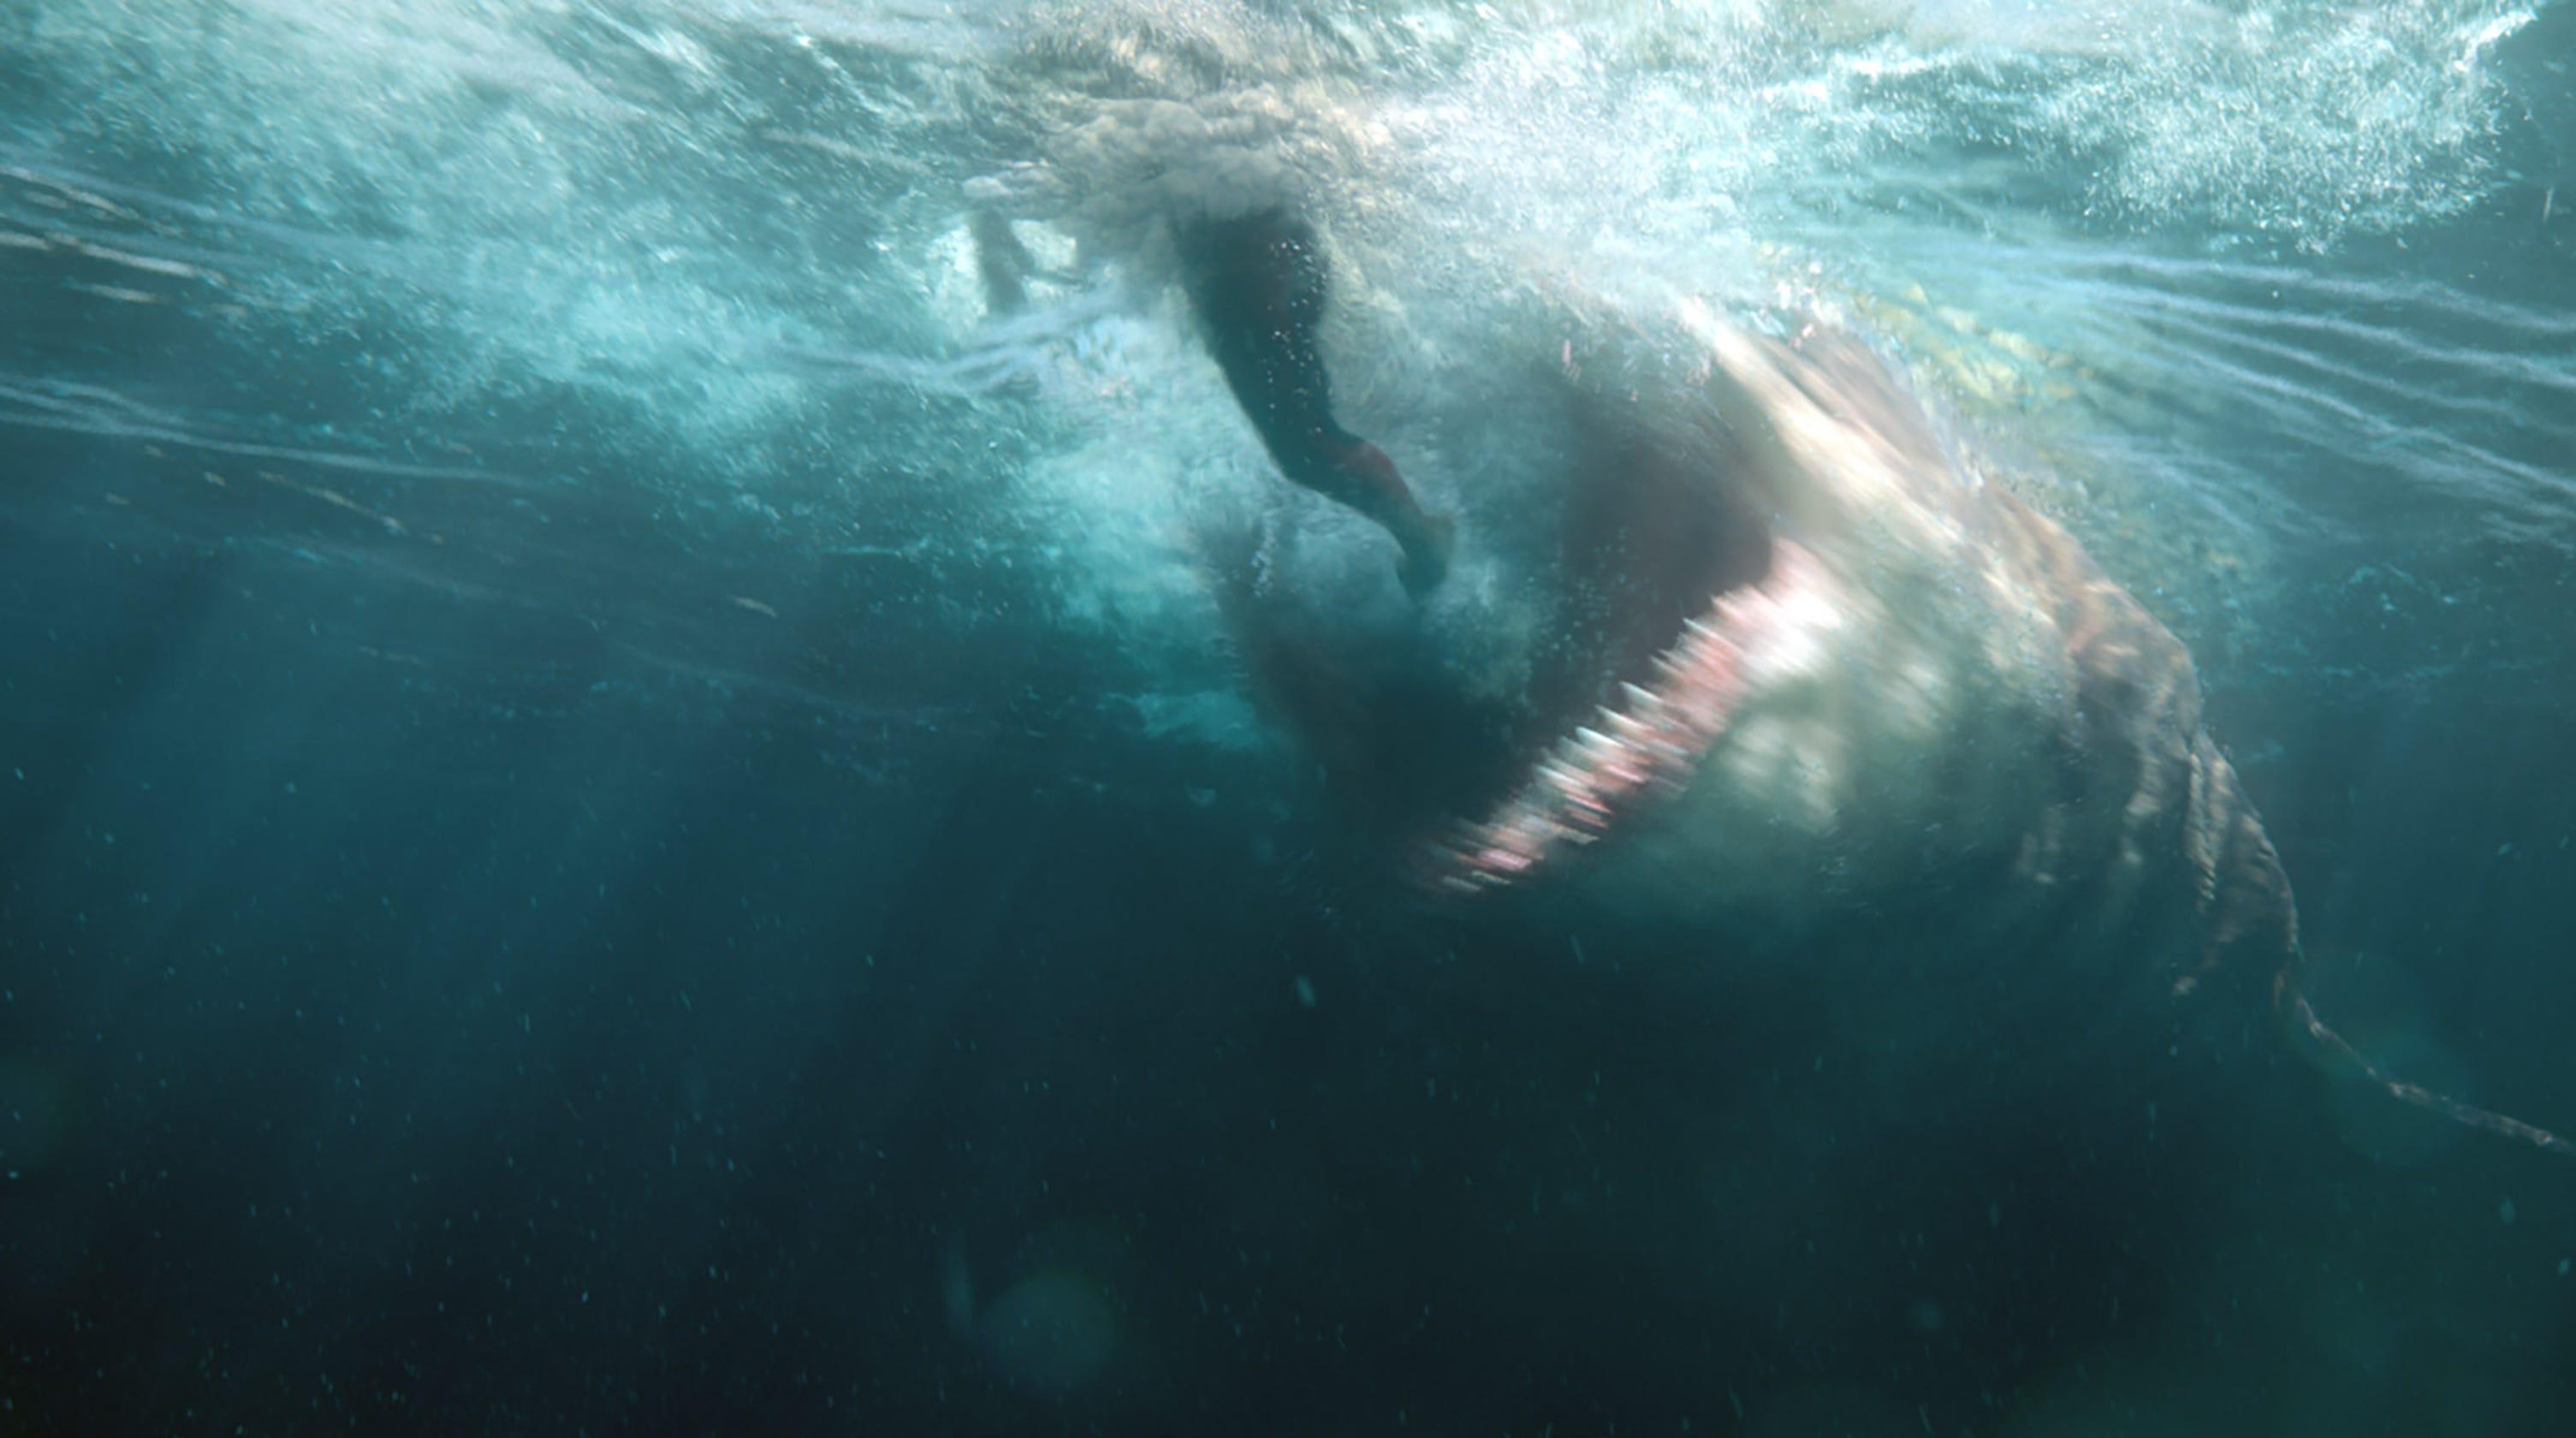 Intel Artificial Intelligence Helps Bring The Meg Mega Shark To Big Screen